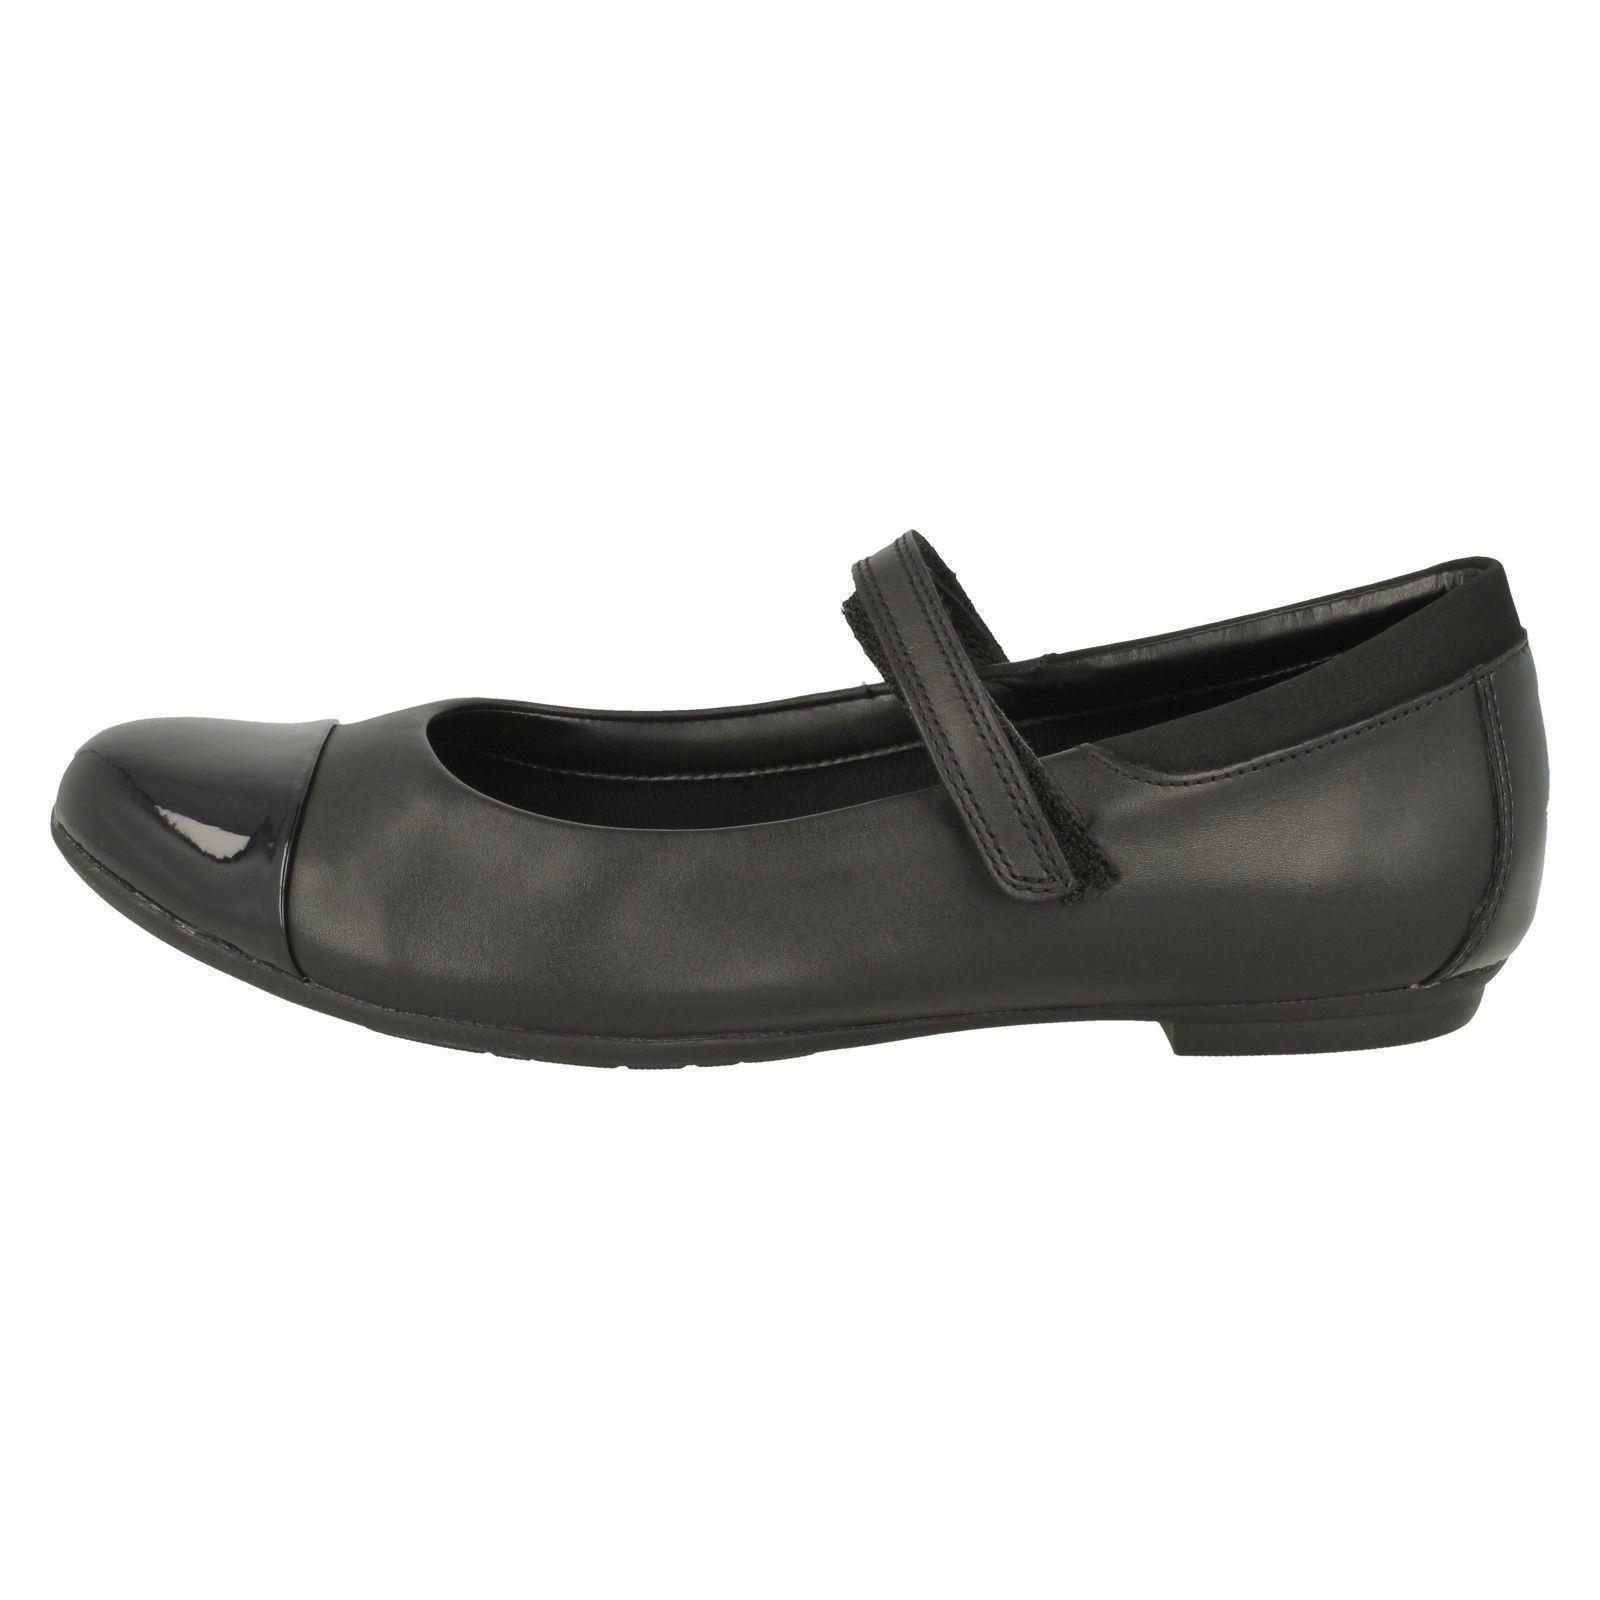 Tizz Talk /'Girls Clarks/' Mary Jane Style School Shoes